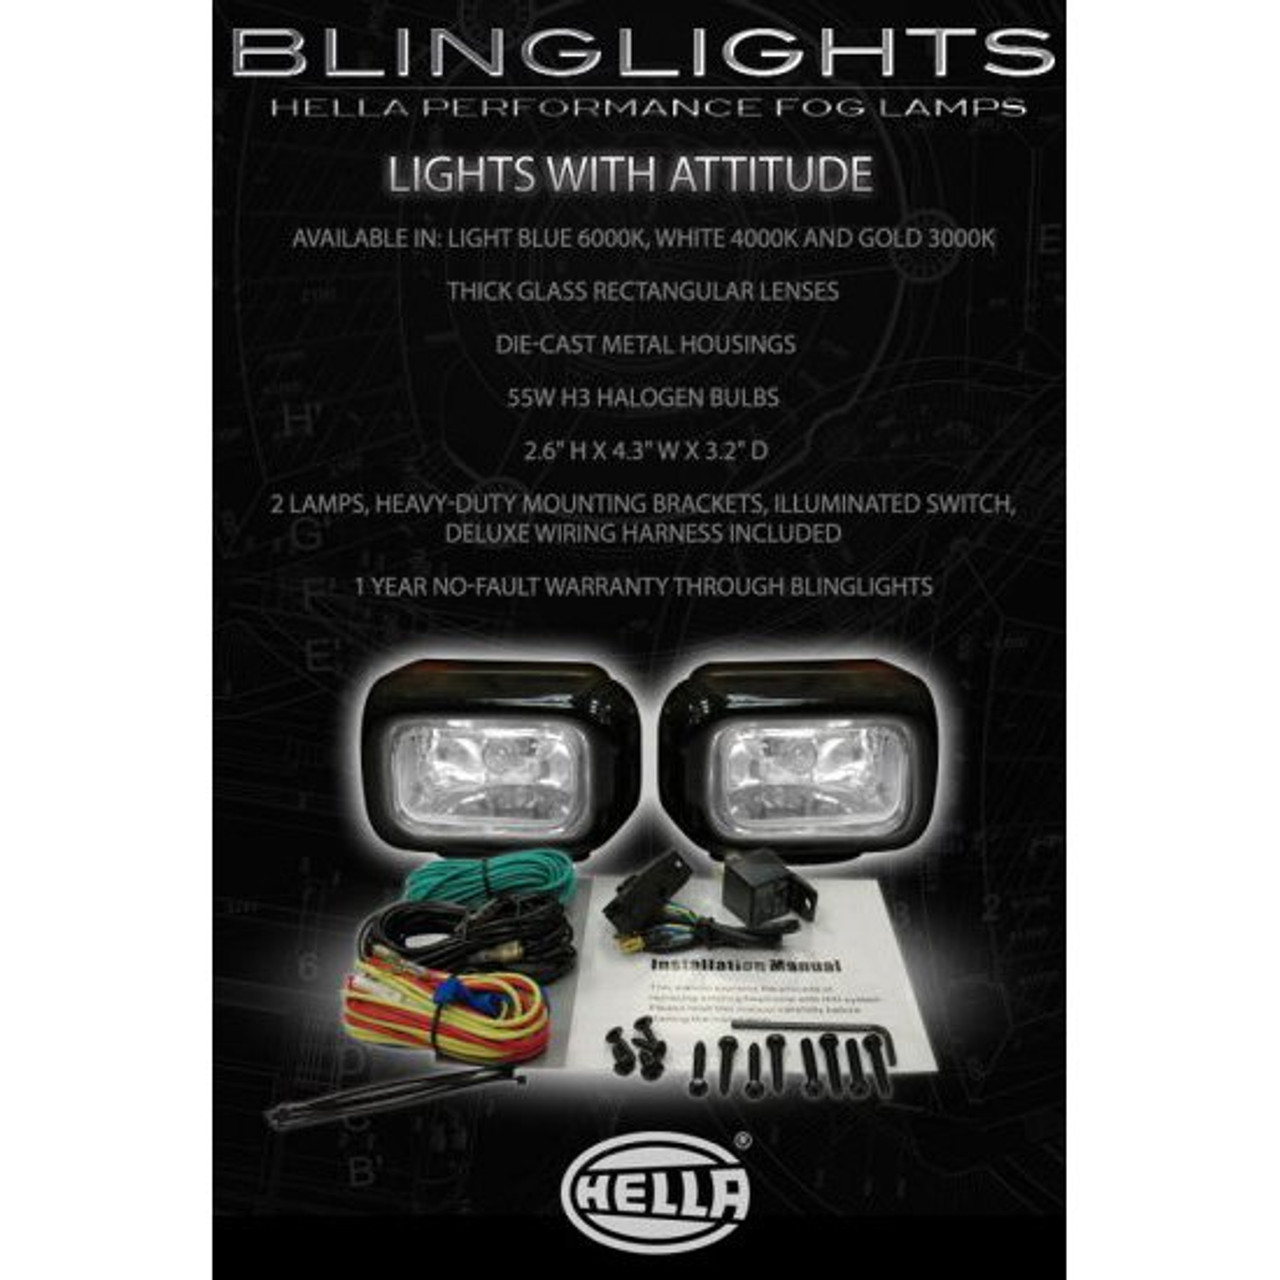 1990 1991 1992 1993 1994 1995 1996 Toyota Camry Xenon Fog Lamps Driving Lights Foglamps Kit